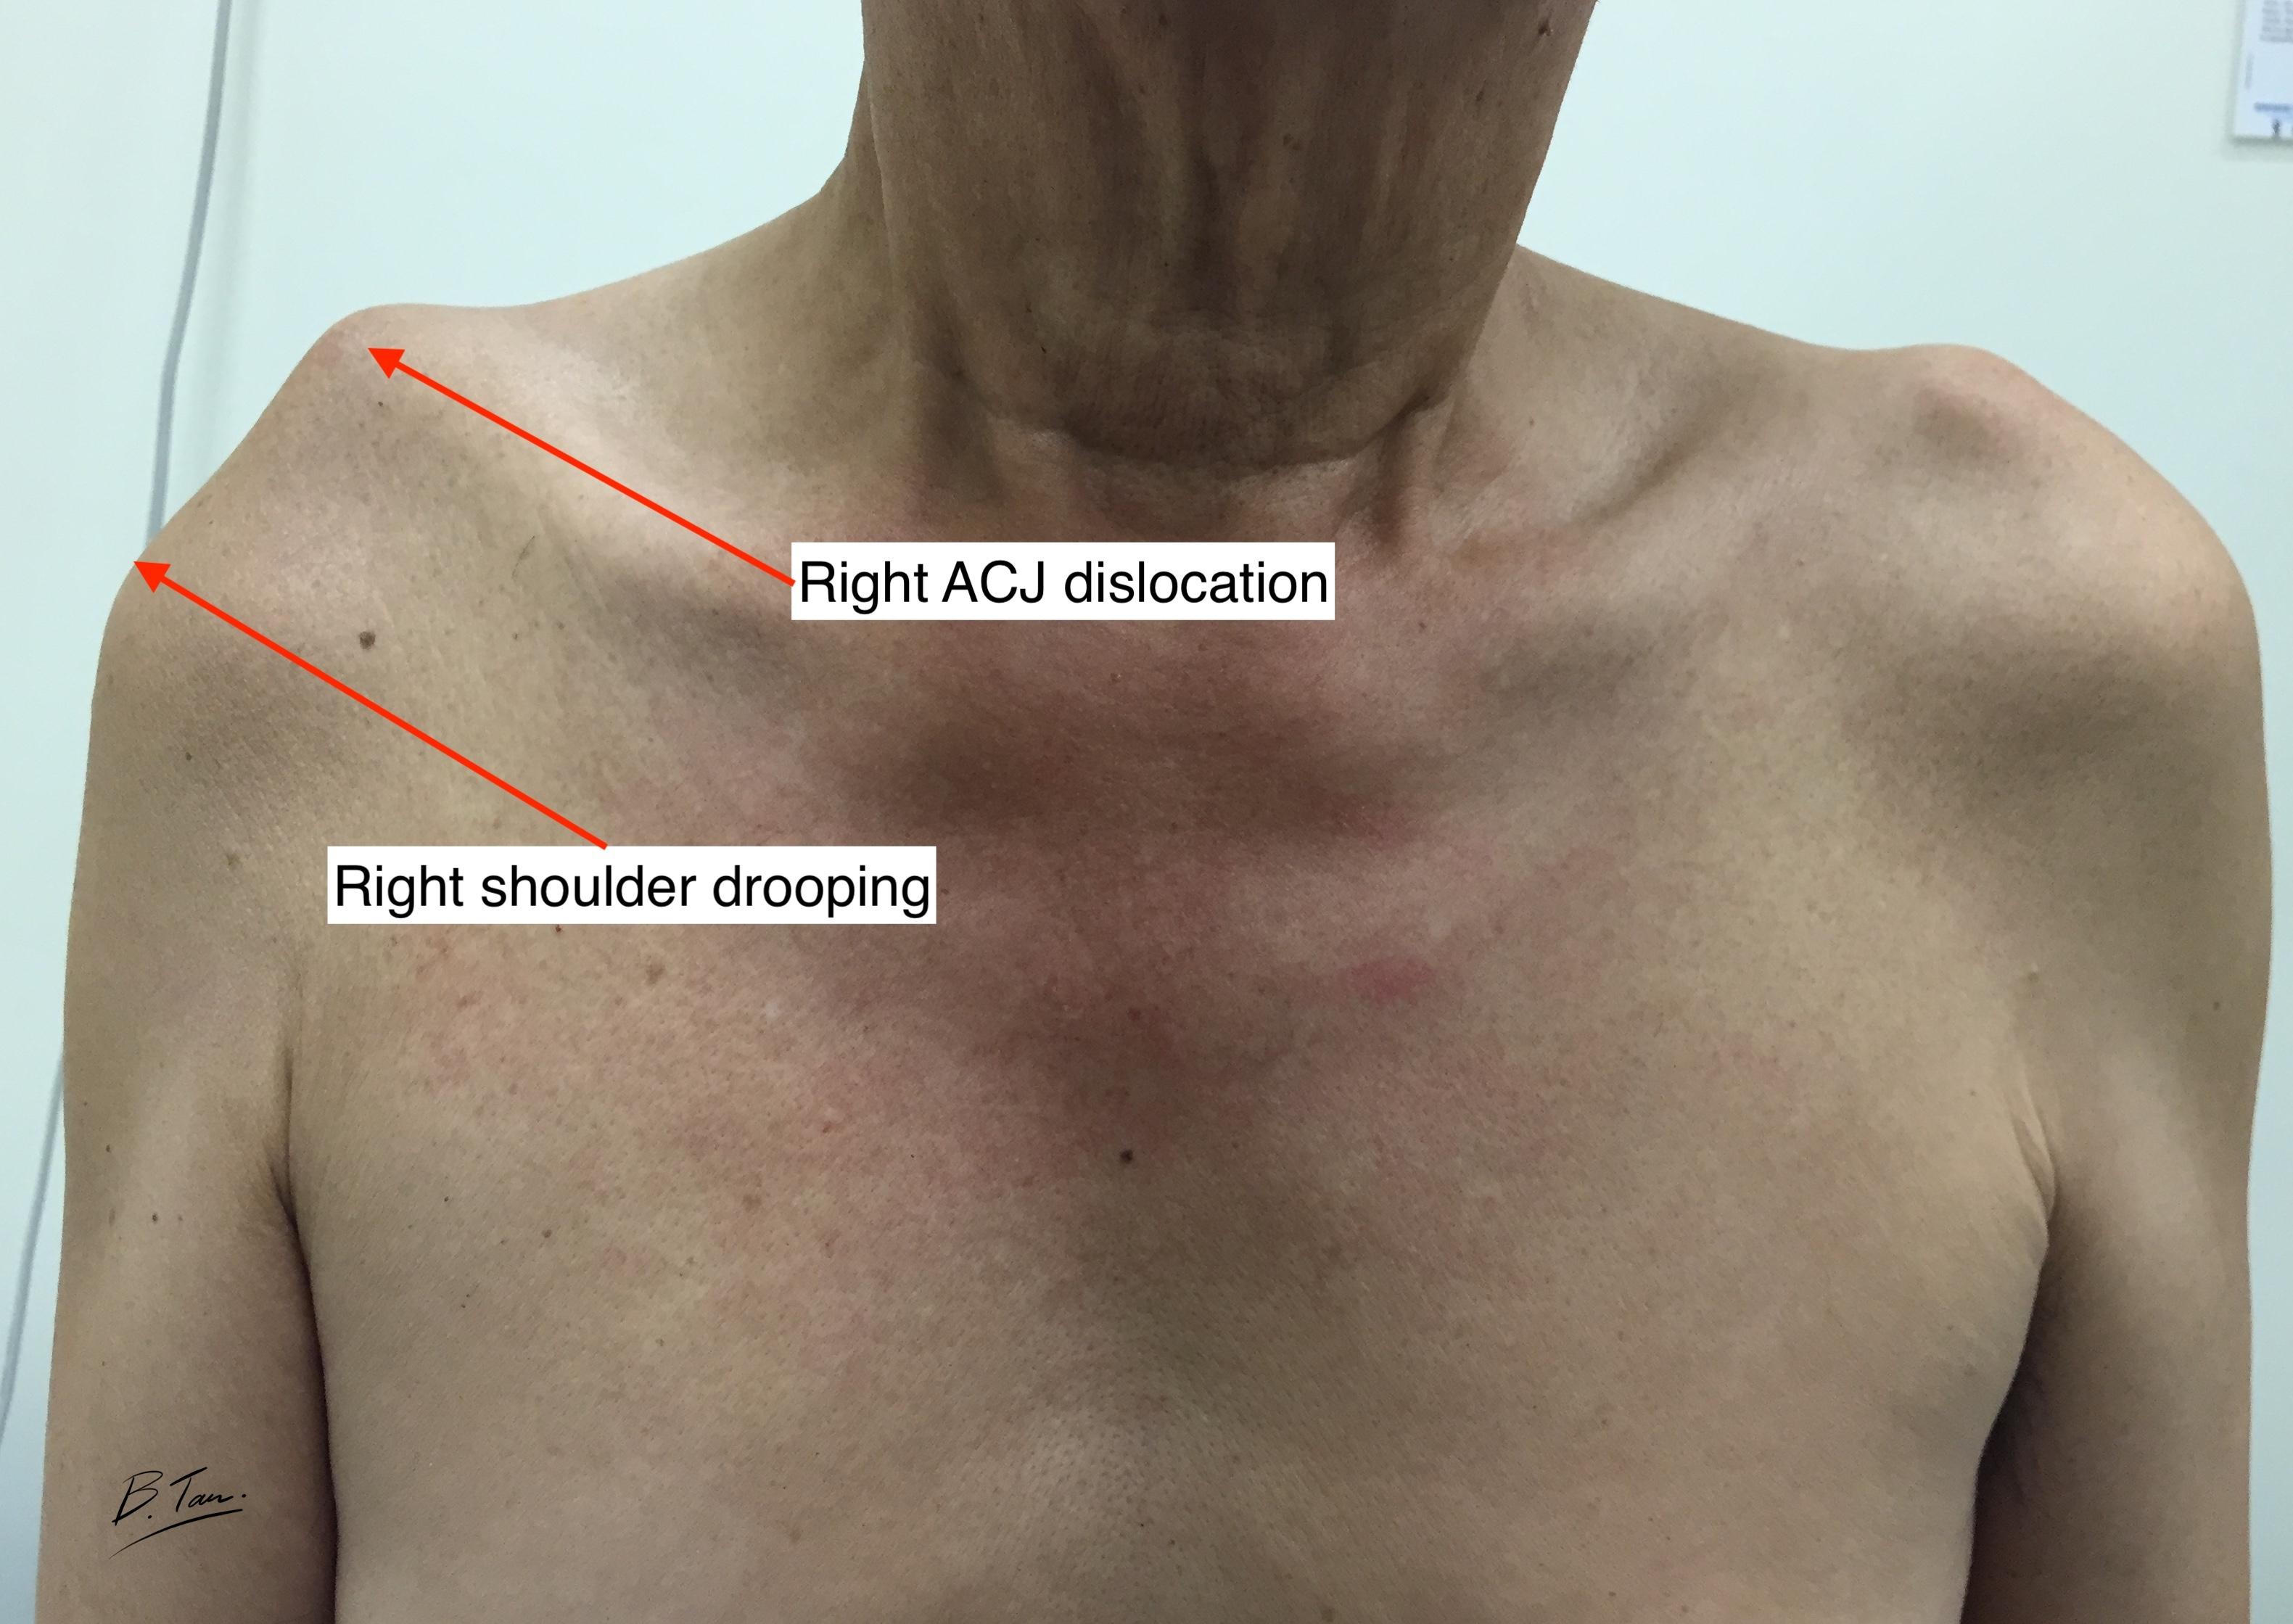 ACJ Dislocation Acromioclavicular joint dislocation